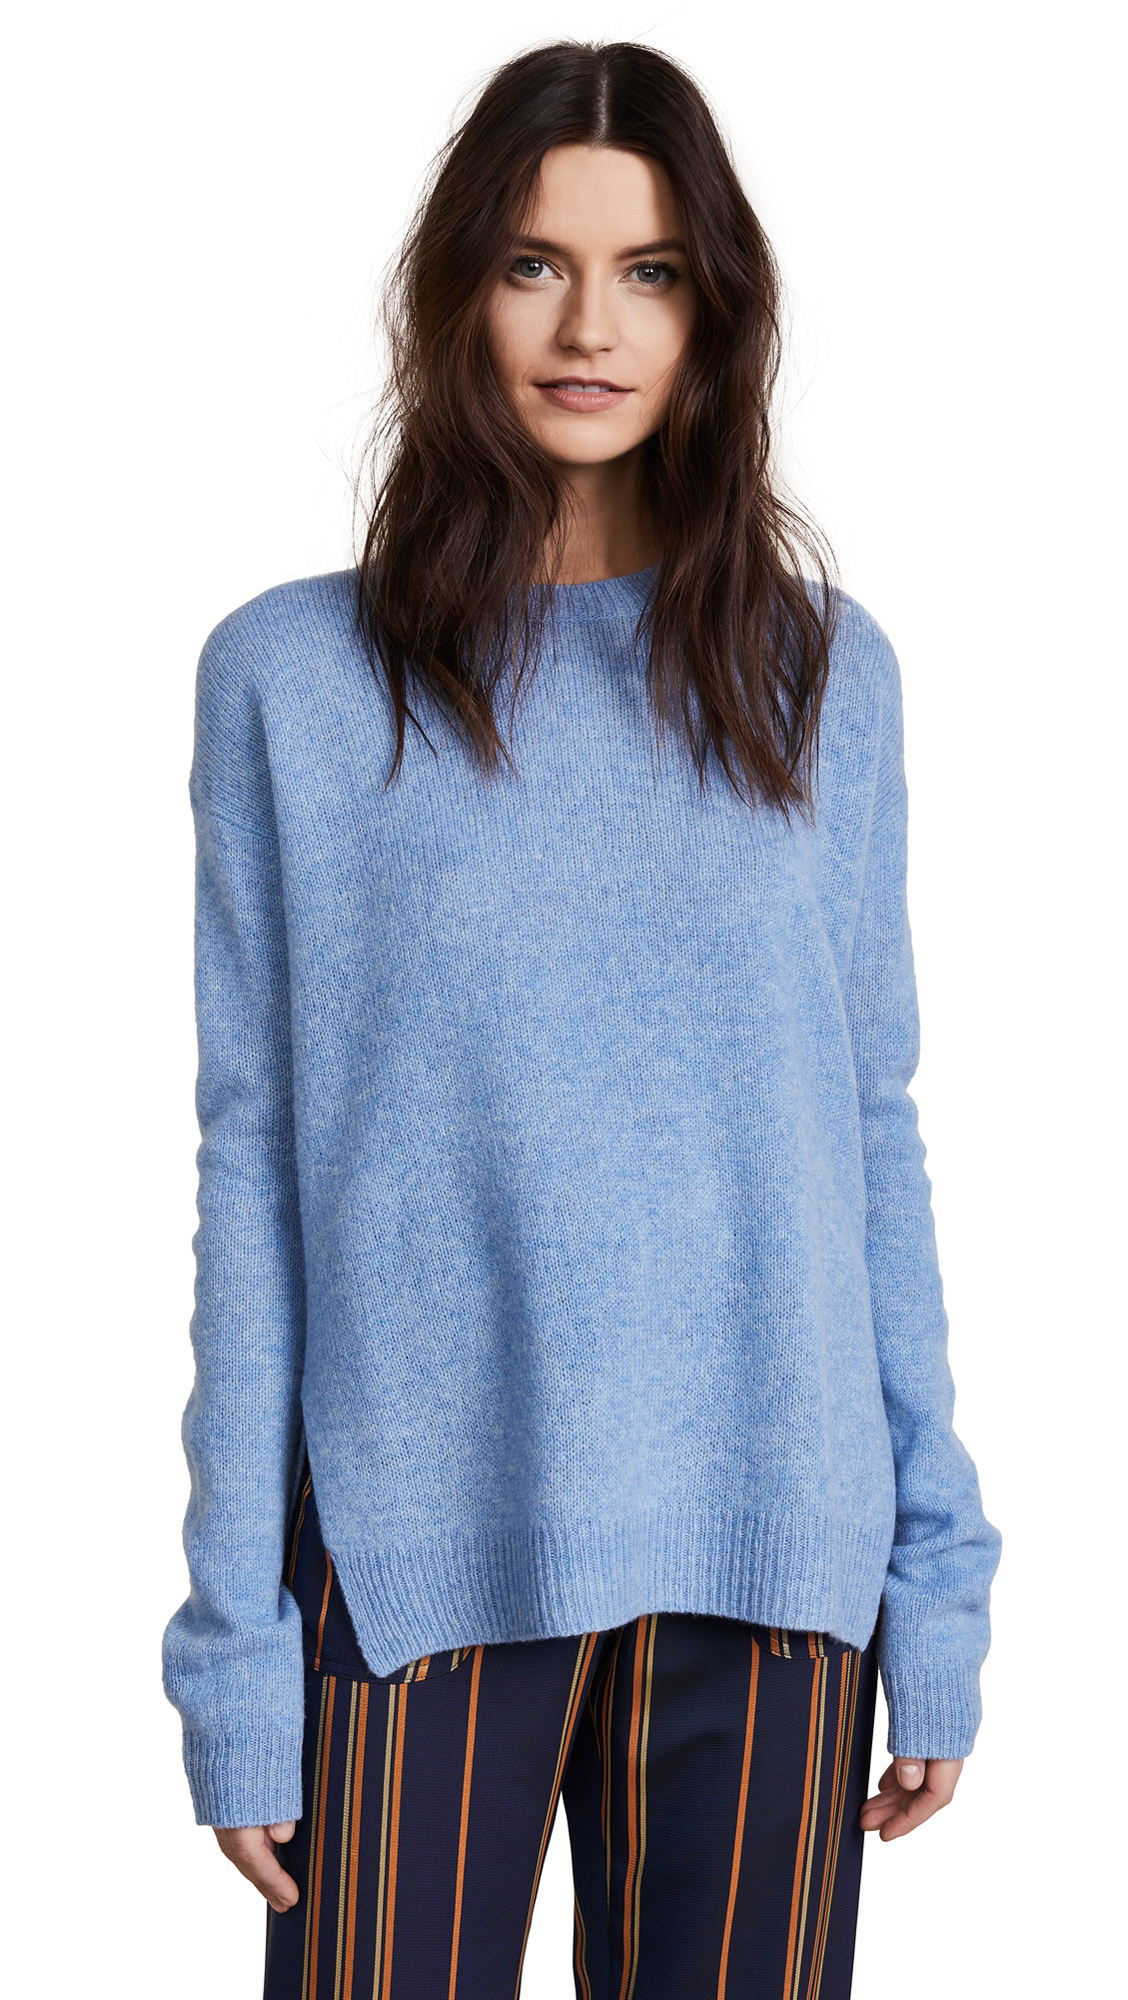 Acne Studios Deniz Wool Sweater - Light Blue Melange